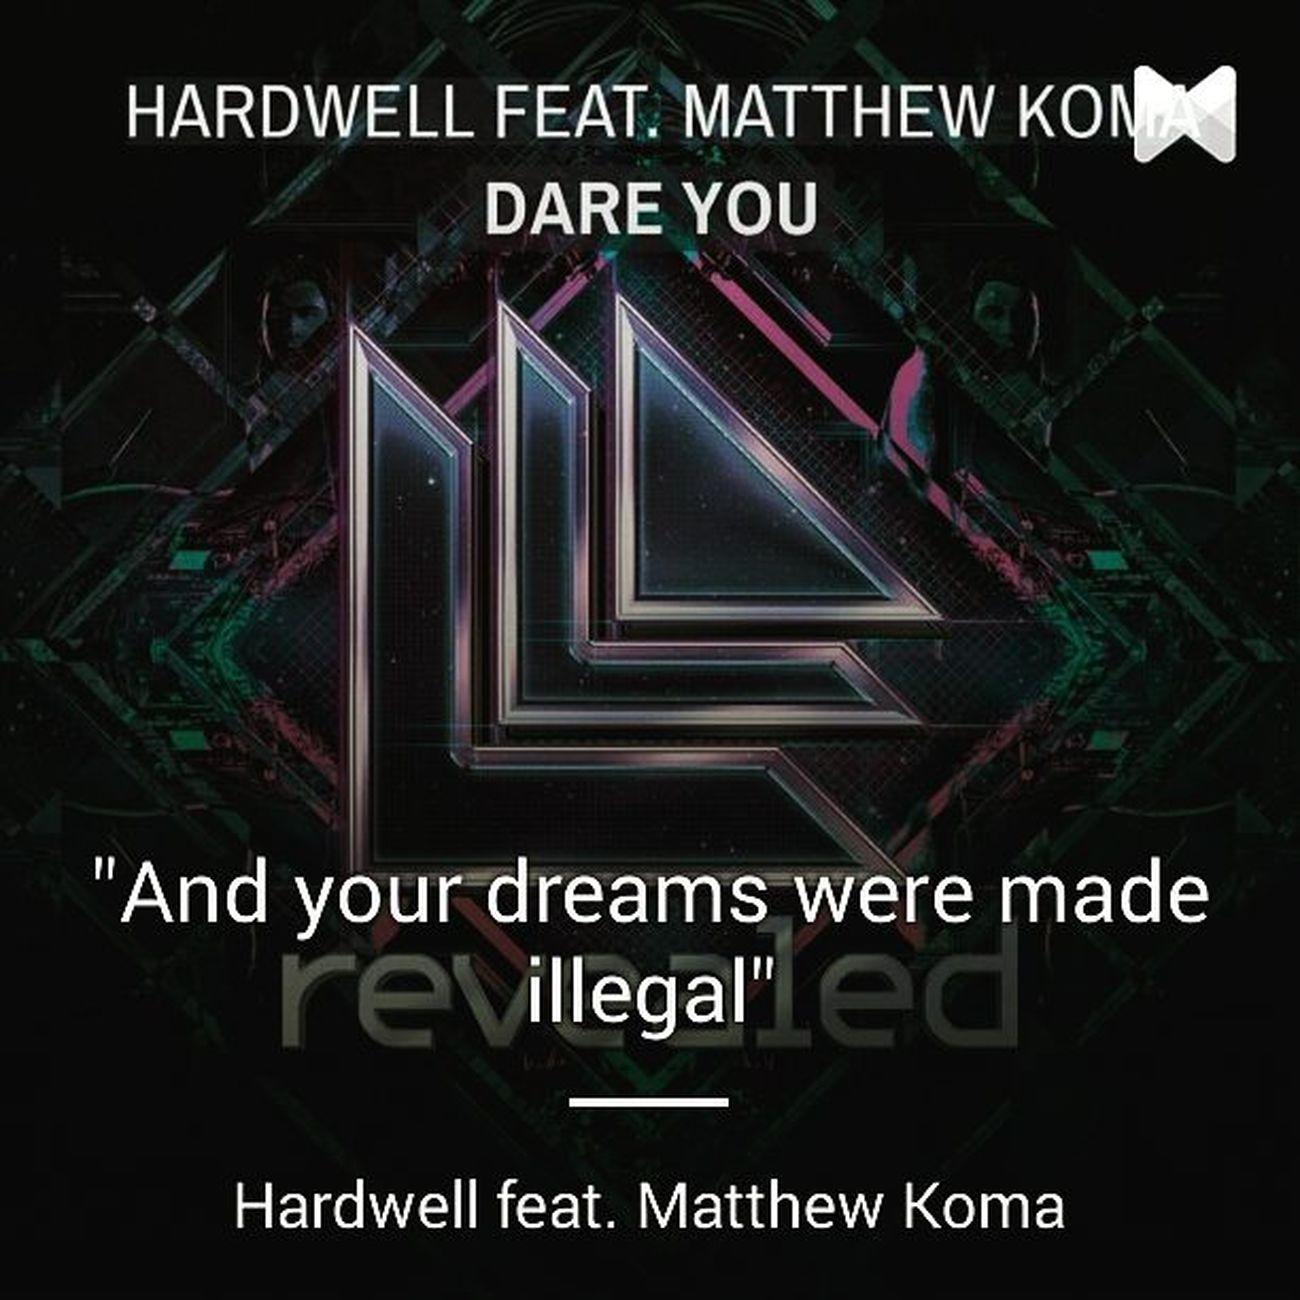 Now playing ♫ Dare You with Lyrics by Hardwell feat. Matthewkoma IAmHardwell